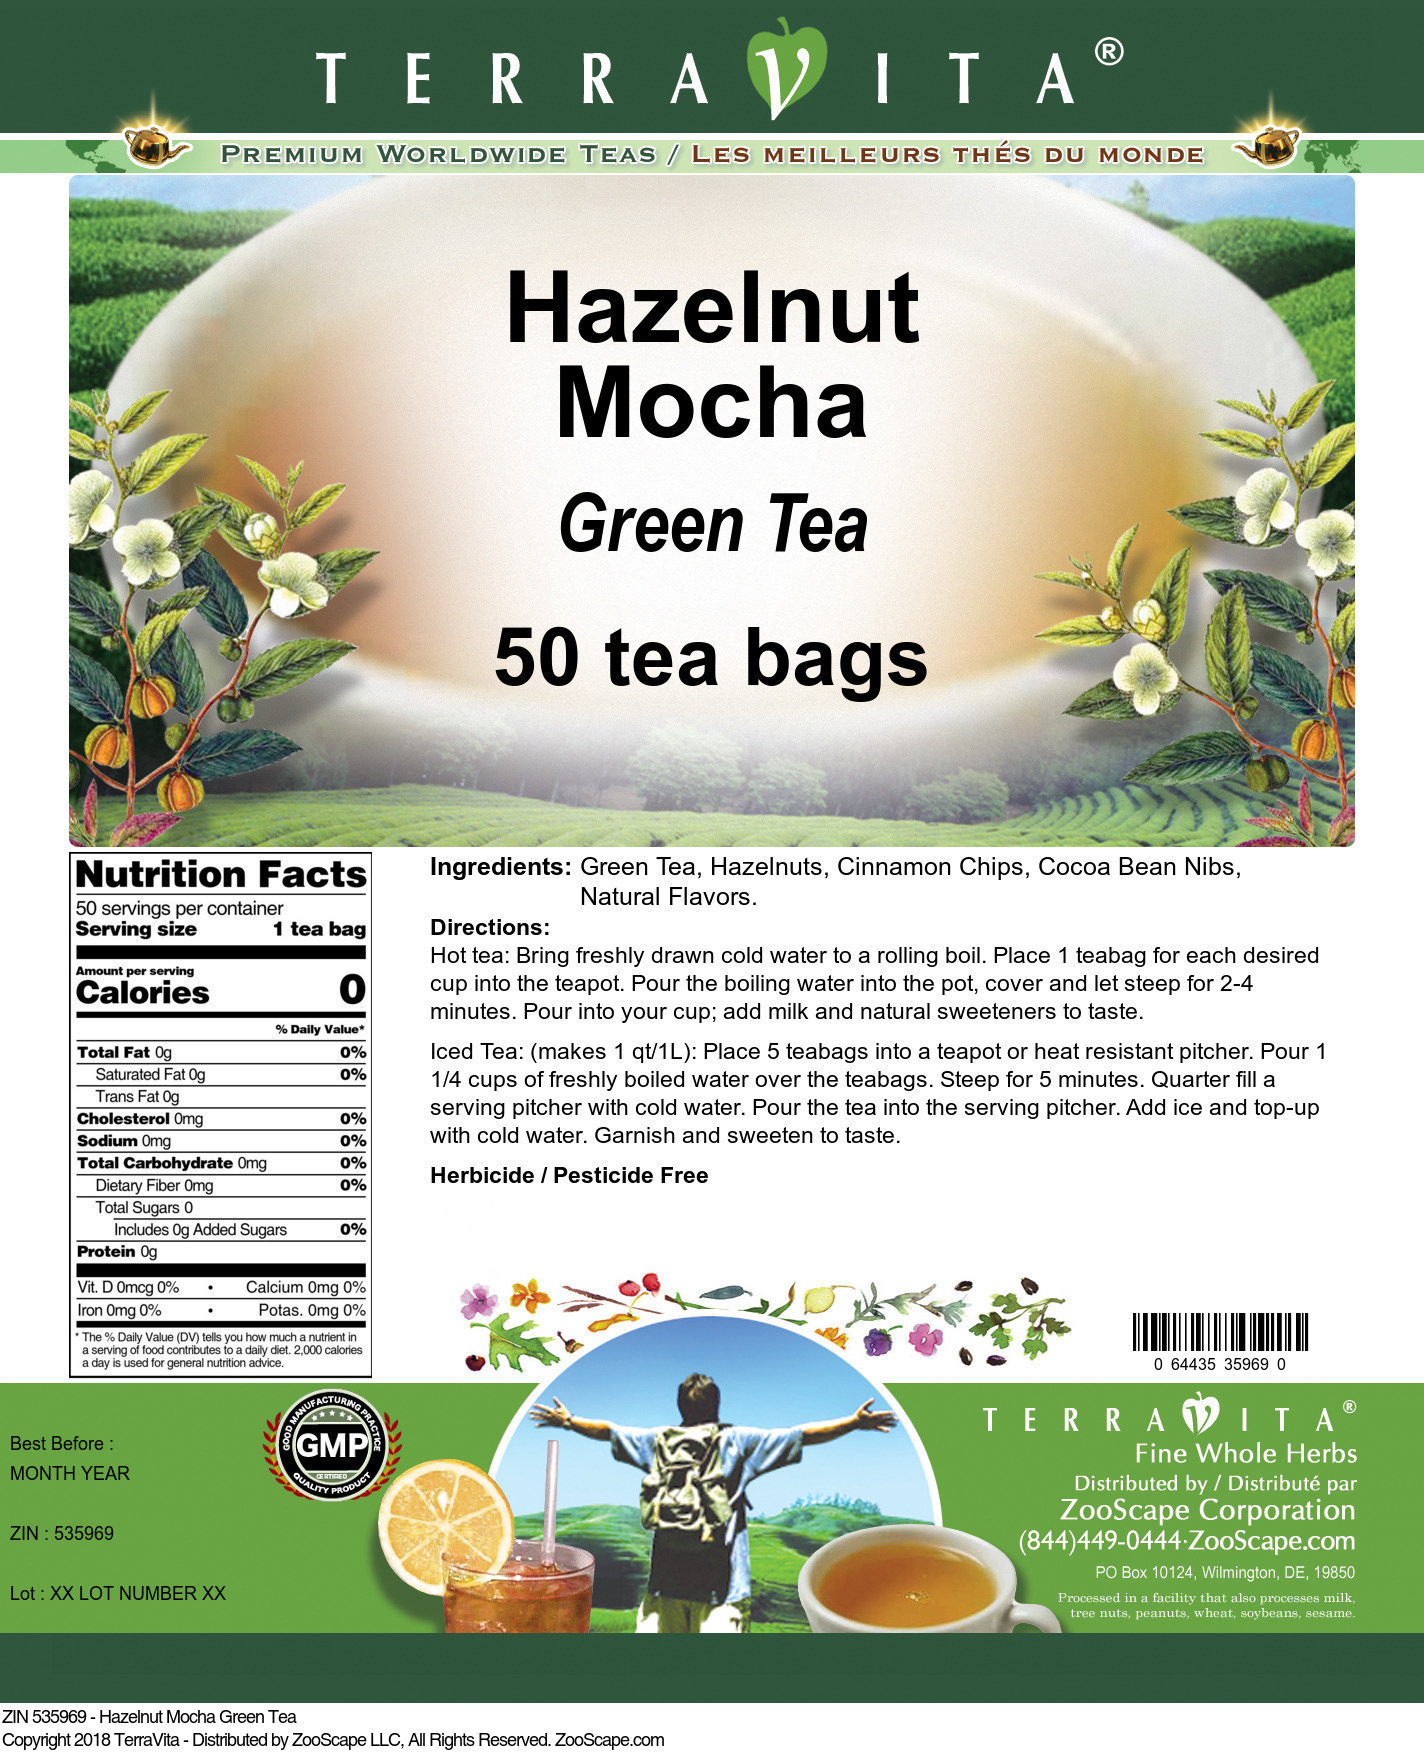 Hazelnut Mocha Green Tea